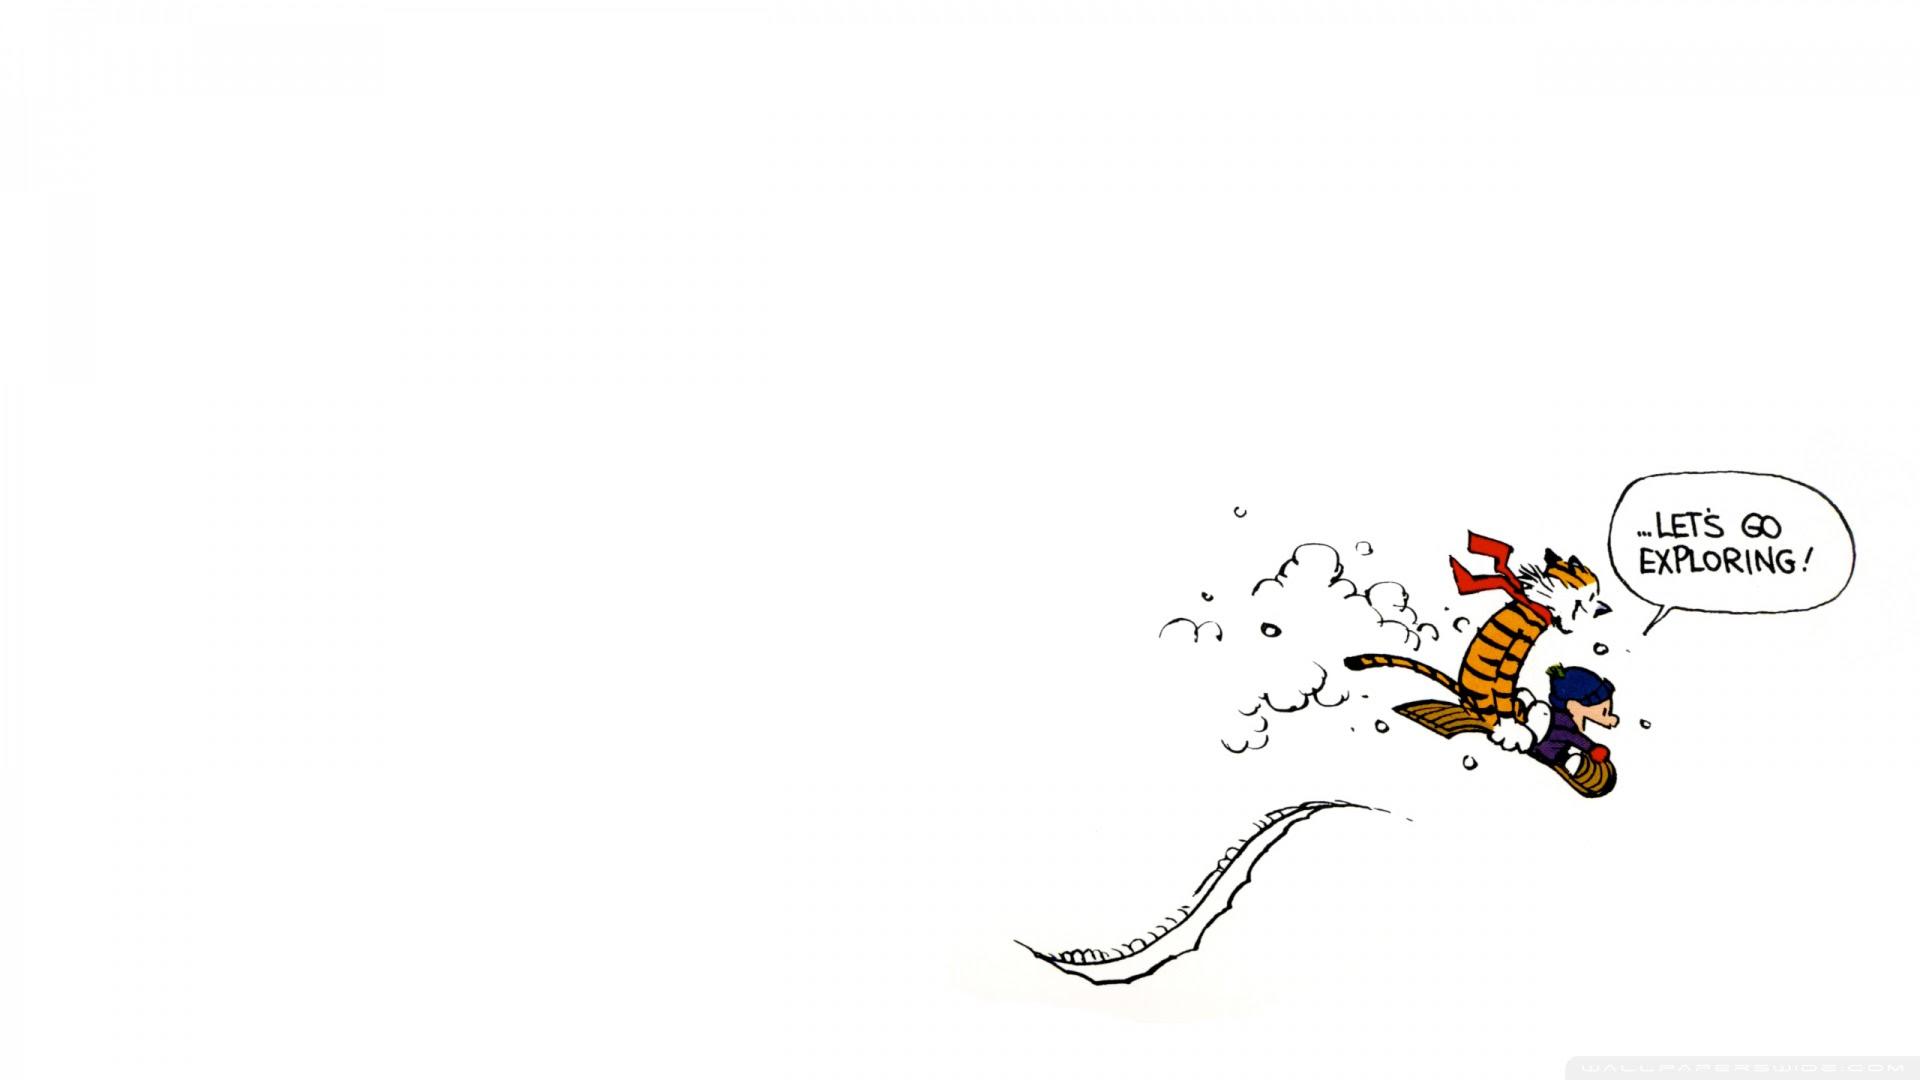 Calvin And Hobbes Exploring Ultra Hd Desktop Background Wallpaper